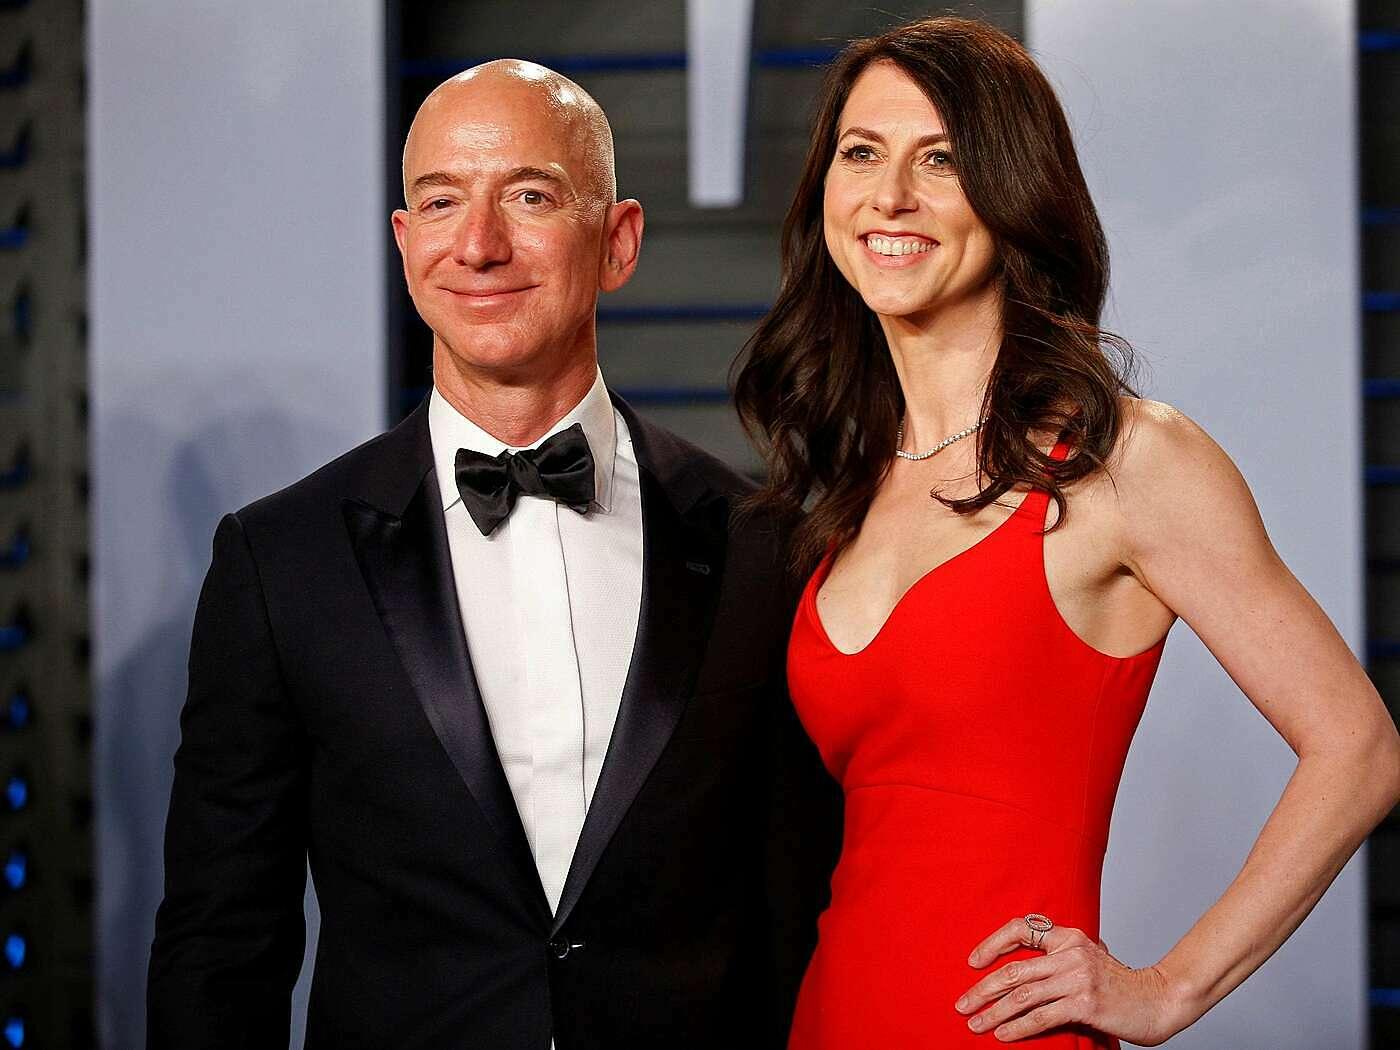 Jeff Bezos và vỡ cũ MacKenzie Bezos tại Tiệc trao giải Oscar 2018. Ảnh: Reuters.